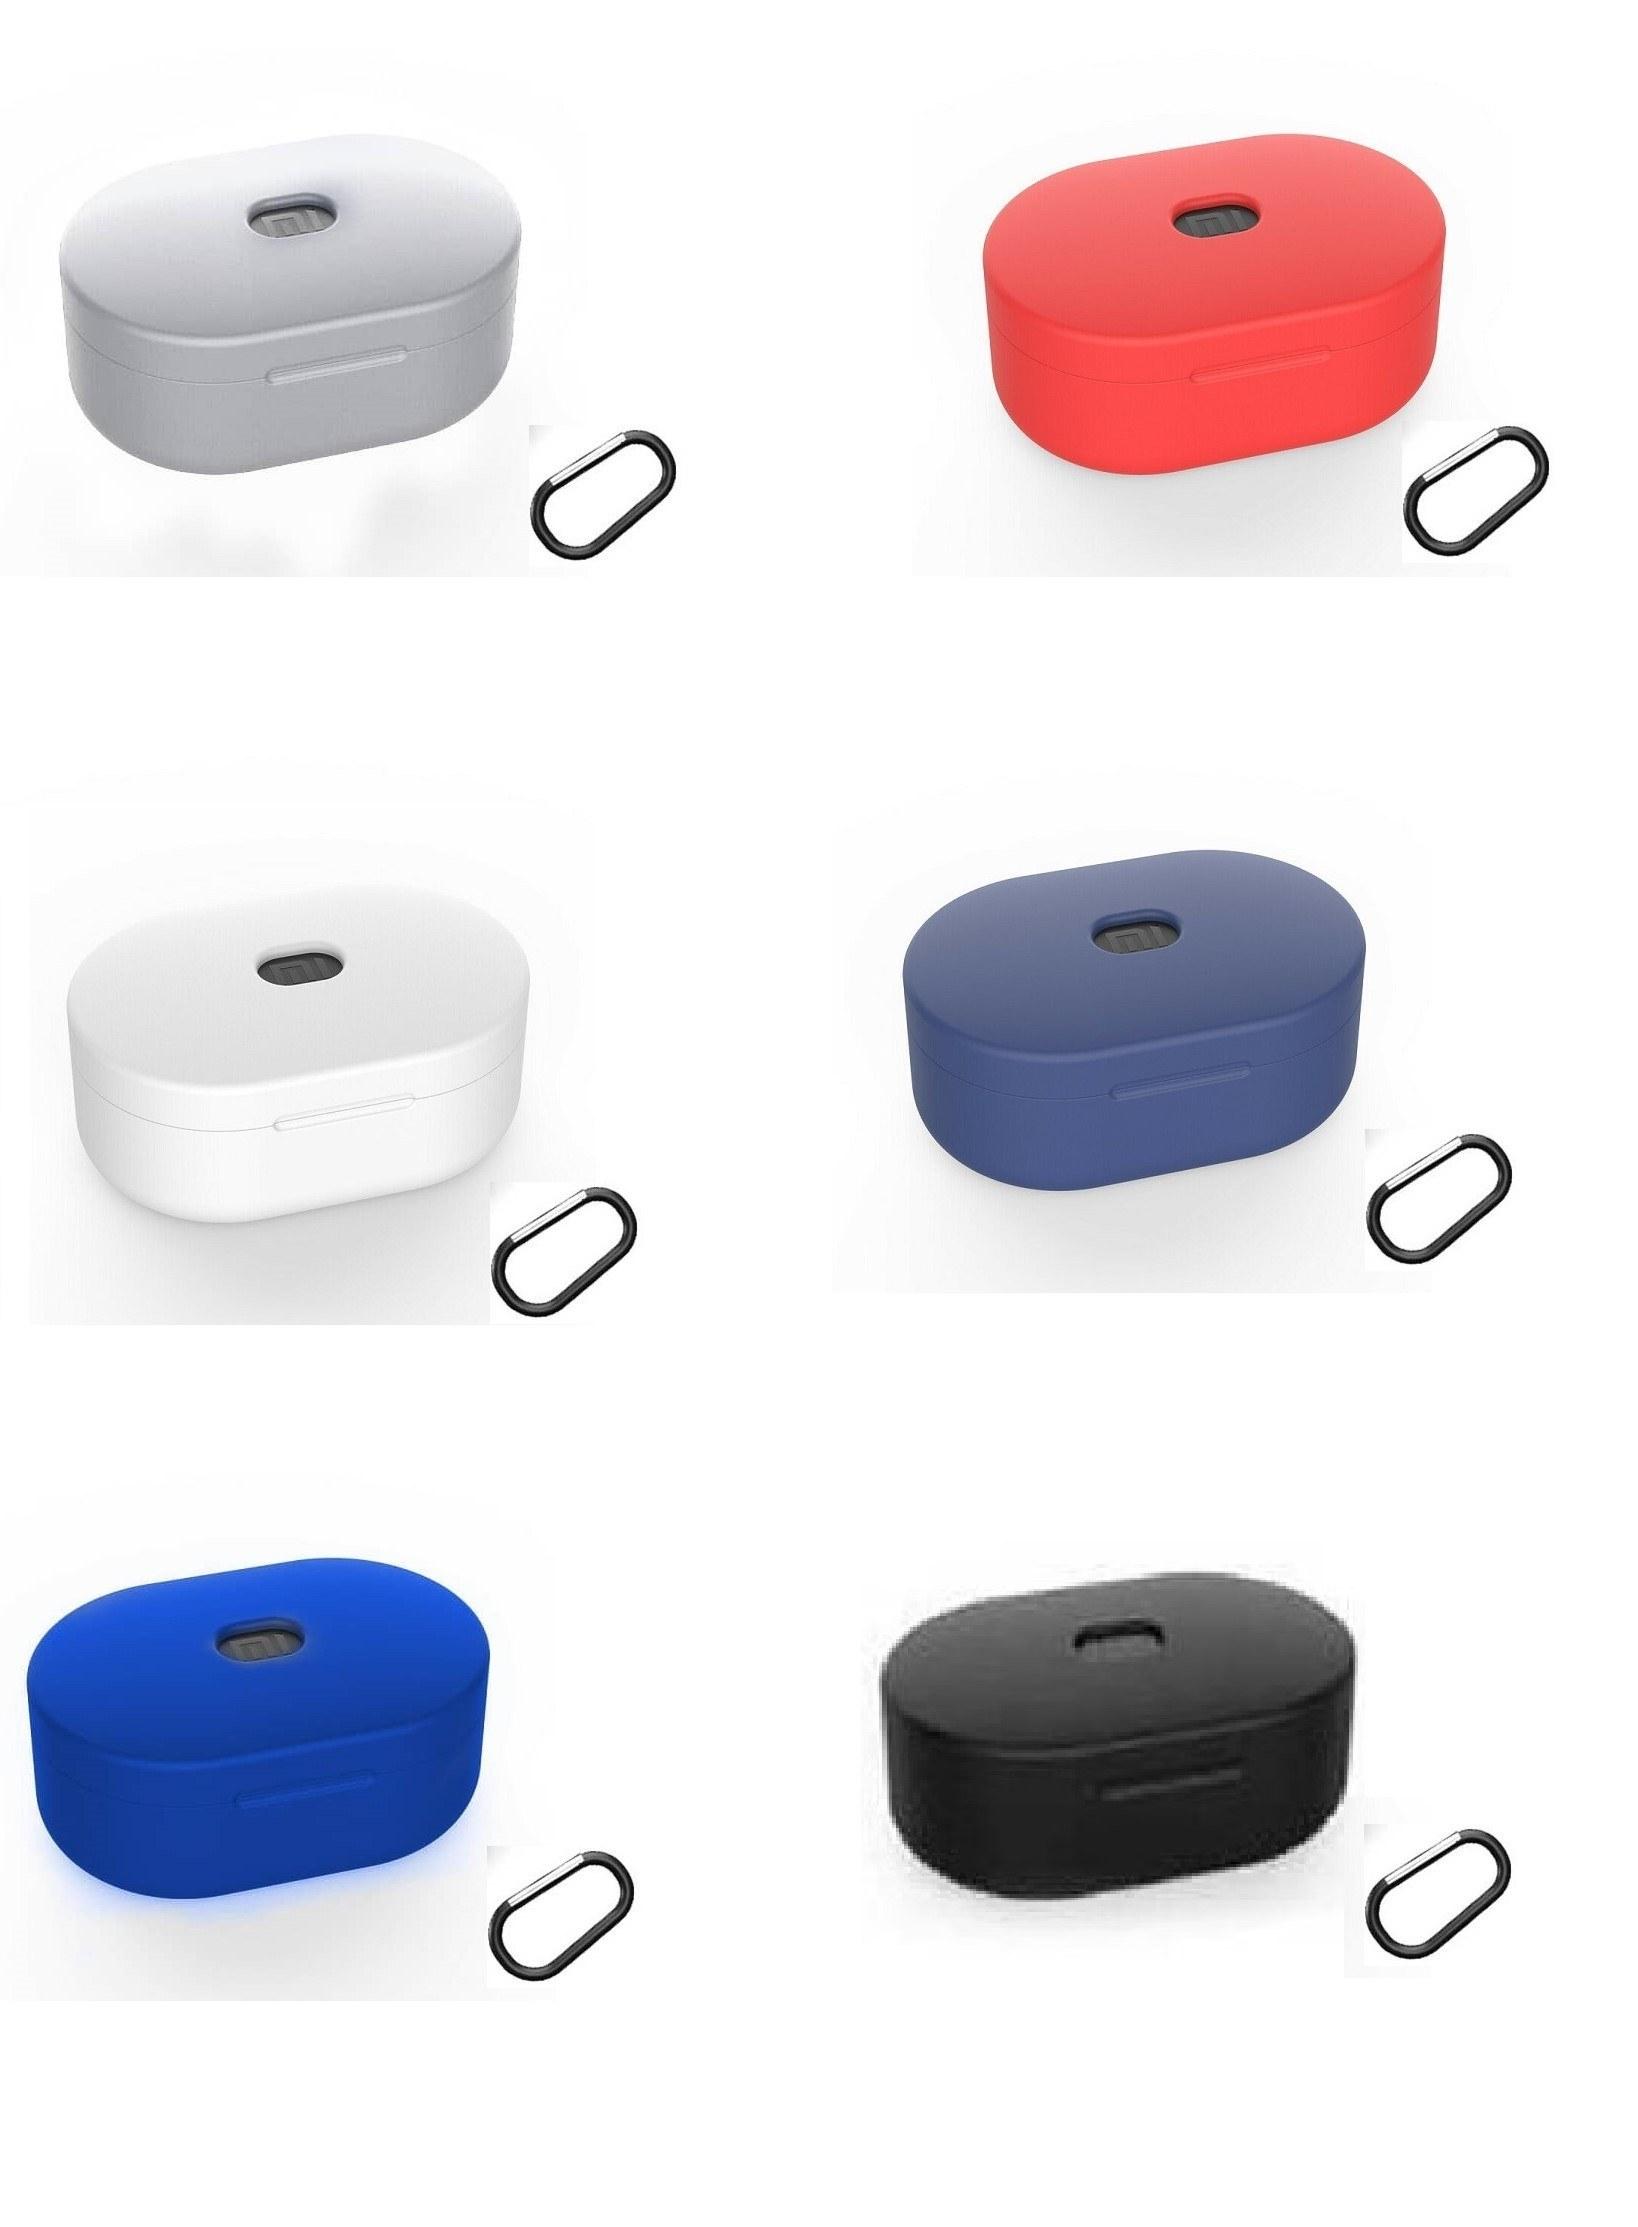 تصویر کاور محافظ سیلیکونی شیائومی Xiaomi Redmi Airdots S / Airdots / Airdots 2 /earbuds basicدارای قلاب آویز Xiaomi cover Redmi Airdots S / Airdots / Airdots 2 /earbuds basic